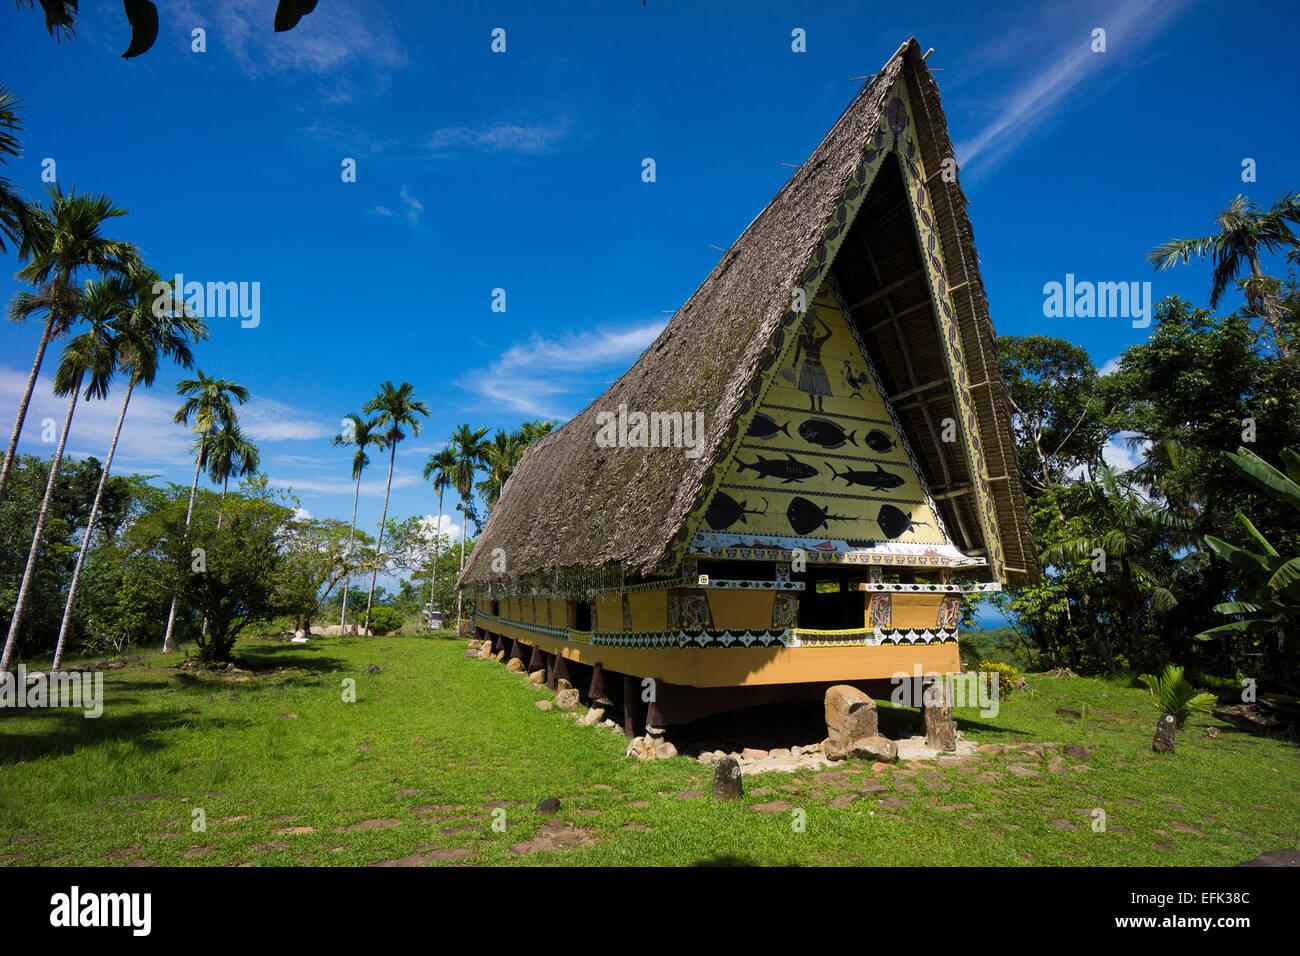 traditional Bai of Palau, the men's house, Babeldaob, Palau, Oceania - Stock Image